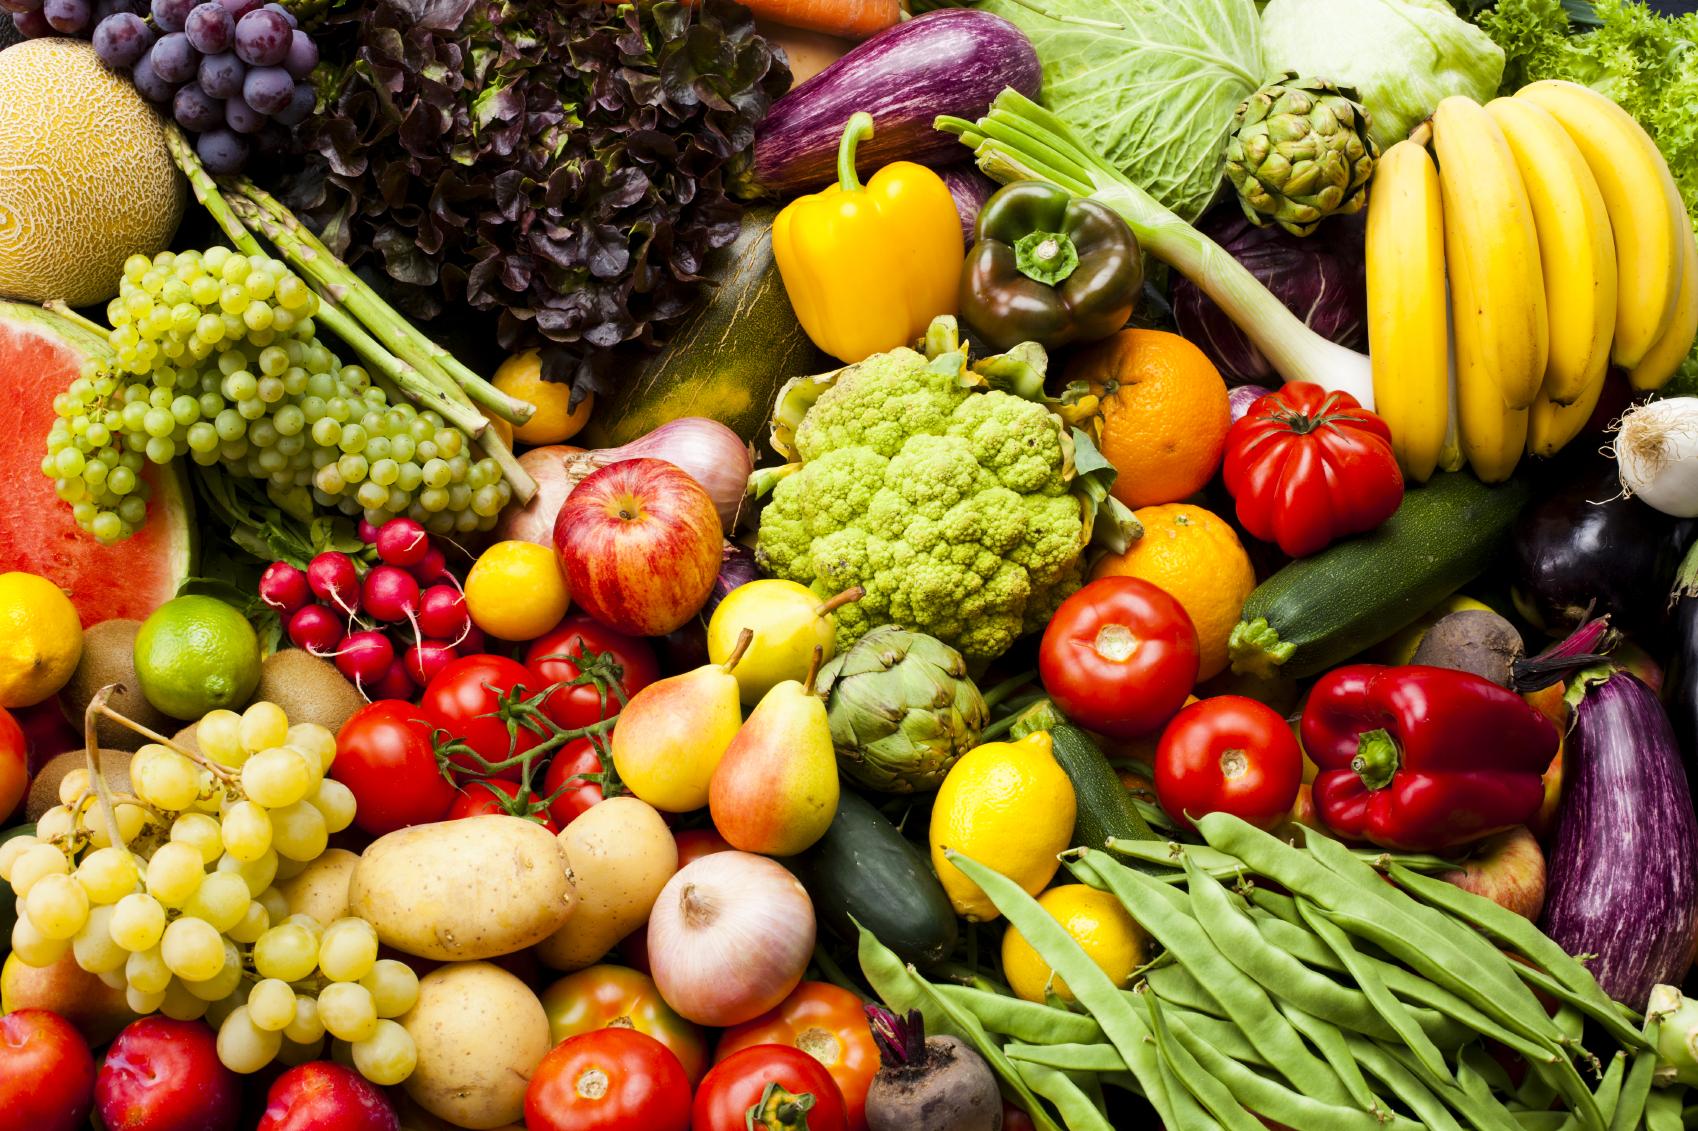 Fruits and vegetables packaging bioplastics